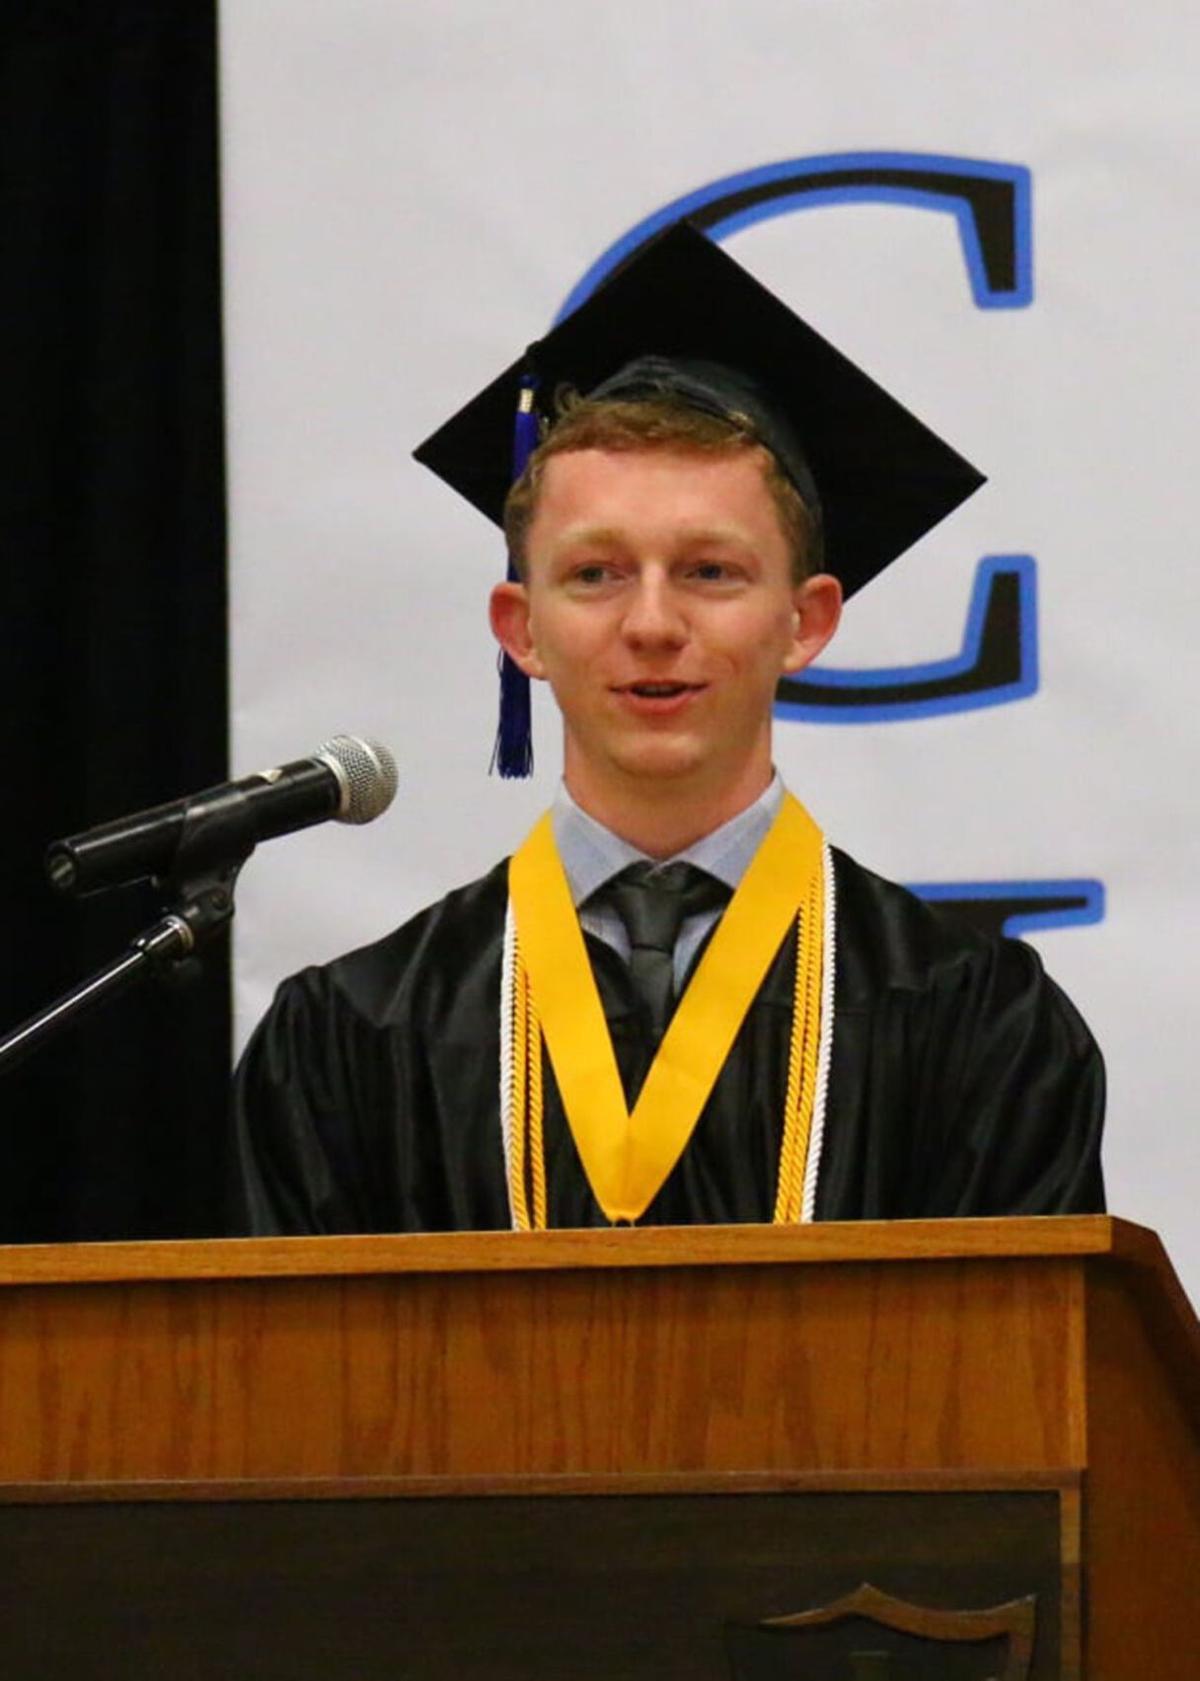 Valedictorian Branton Tolkamp